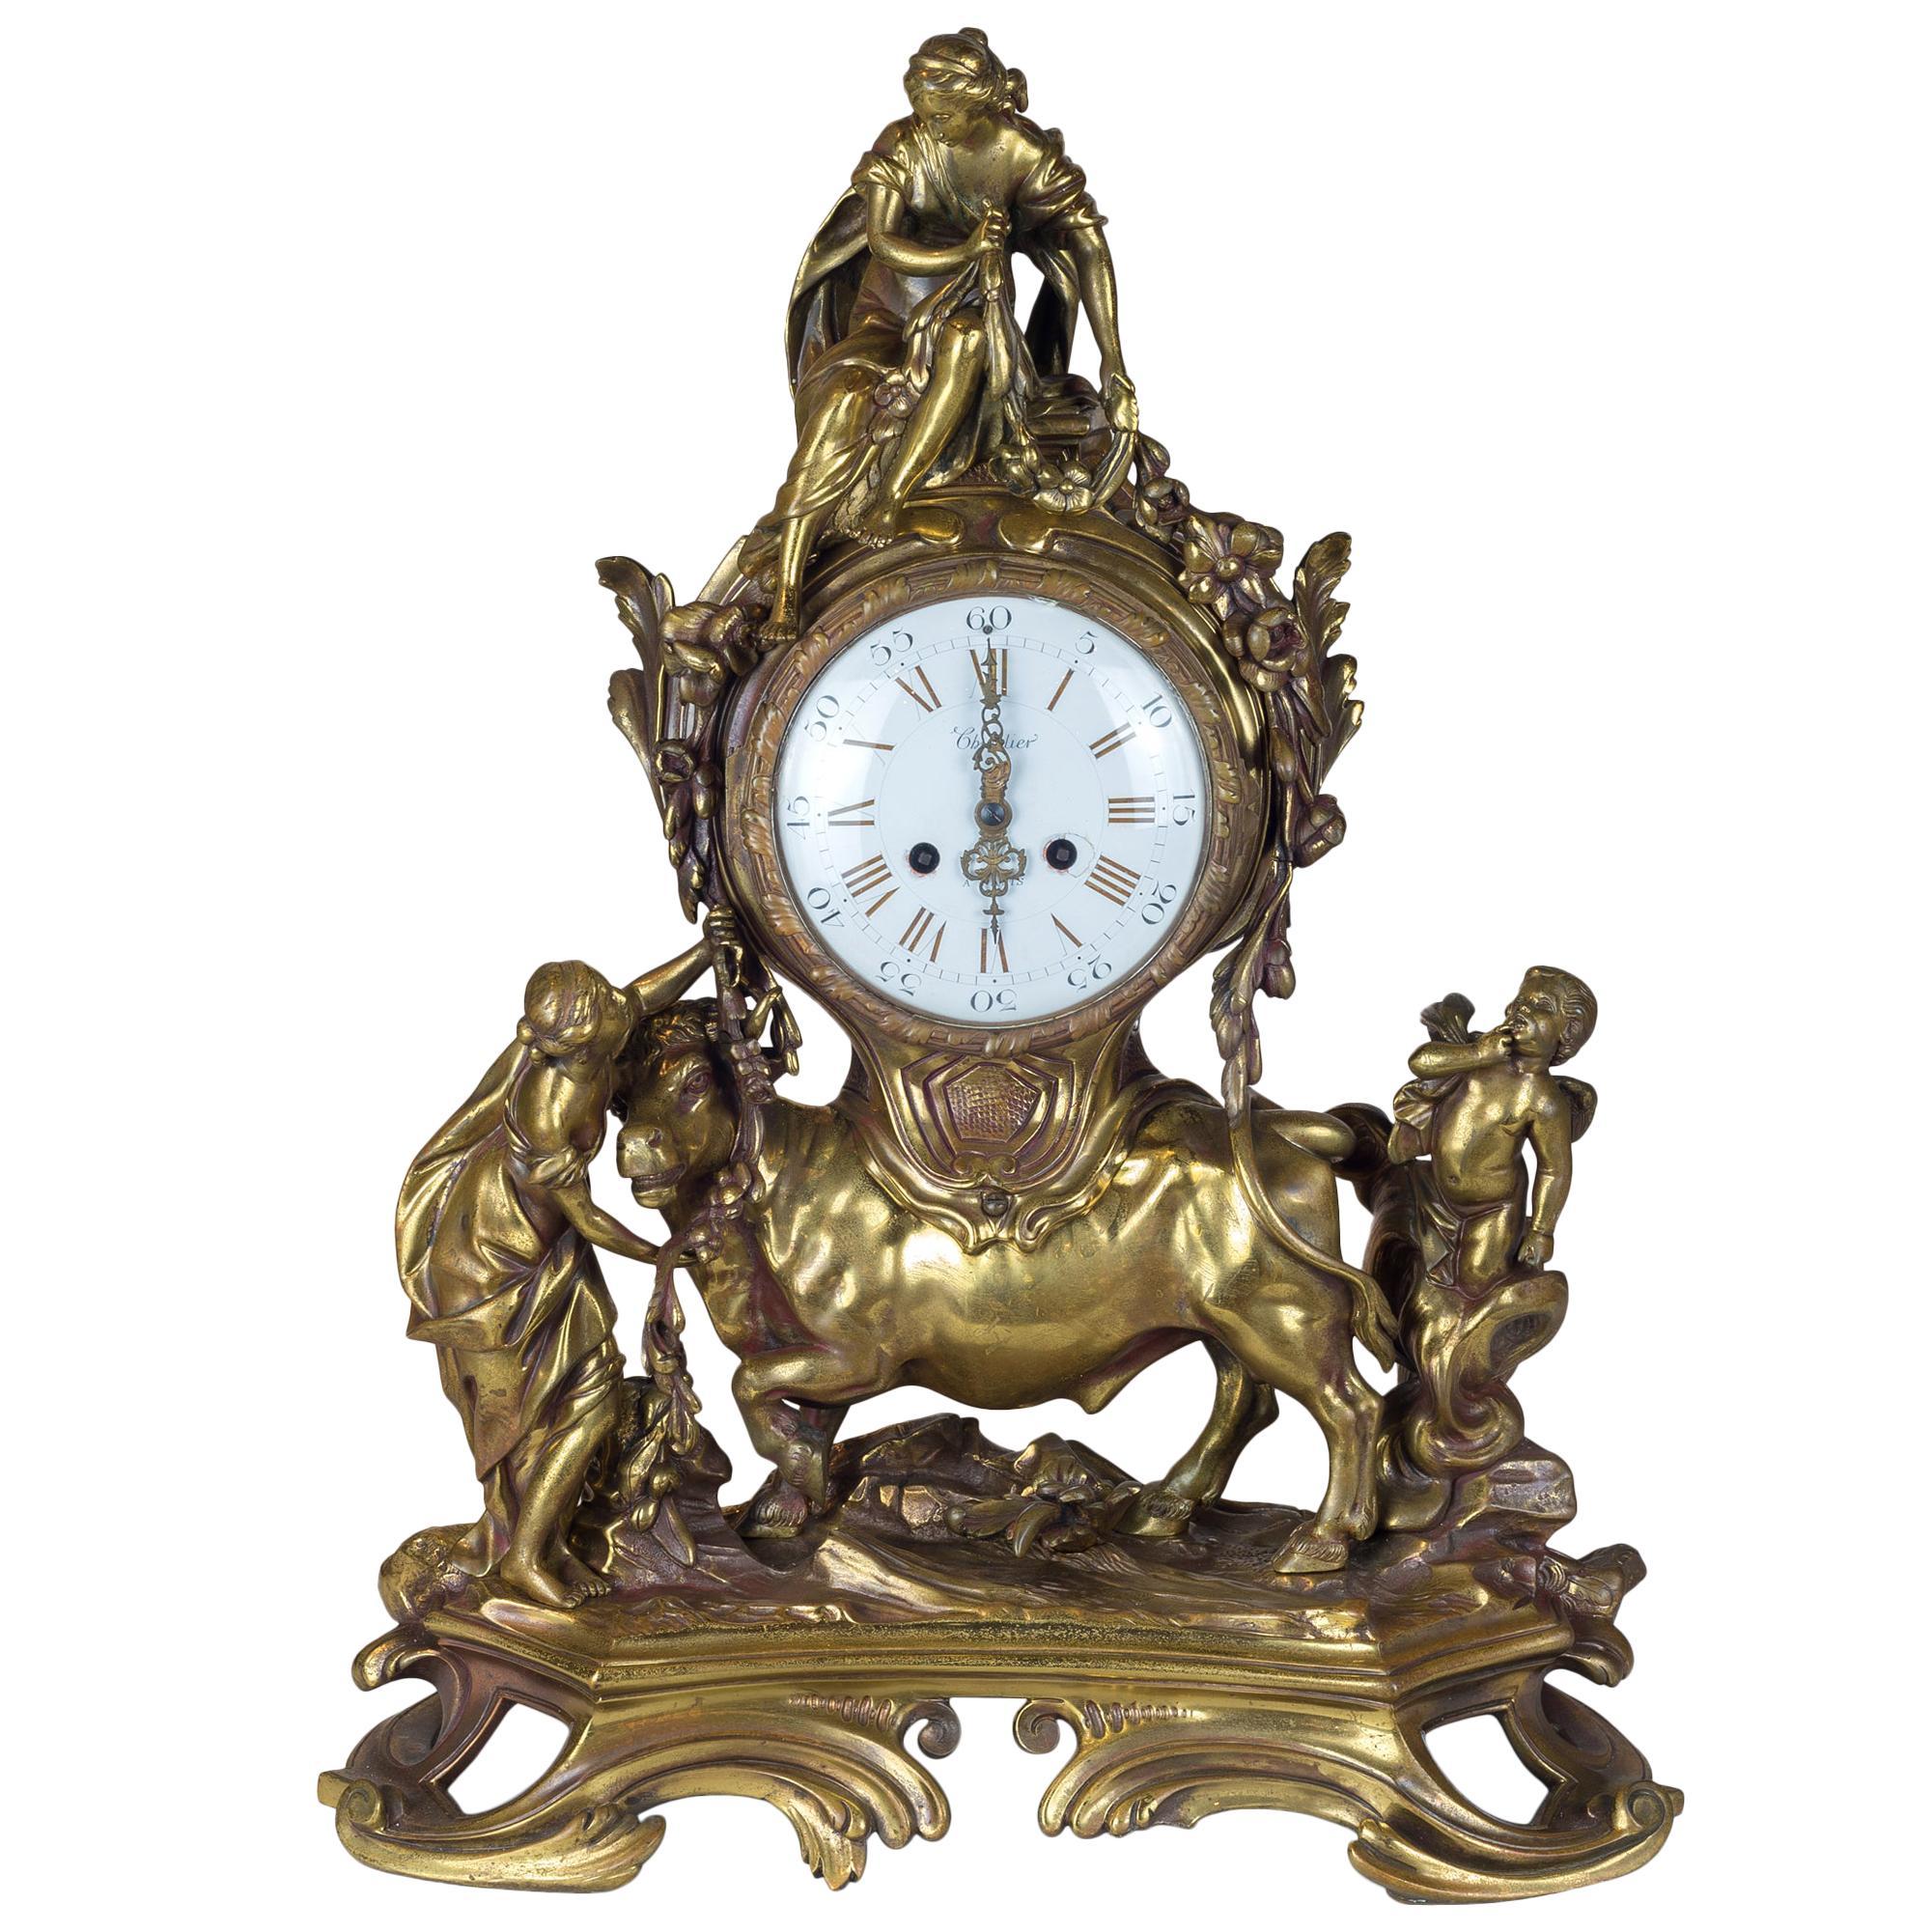 19th Century French Gilt Bronze Figural Mantel Clock